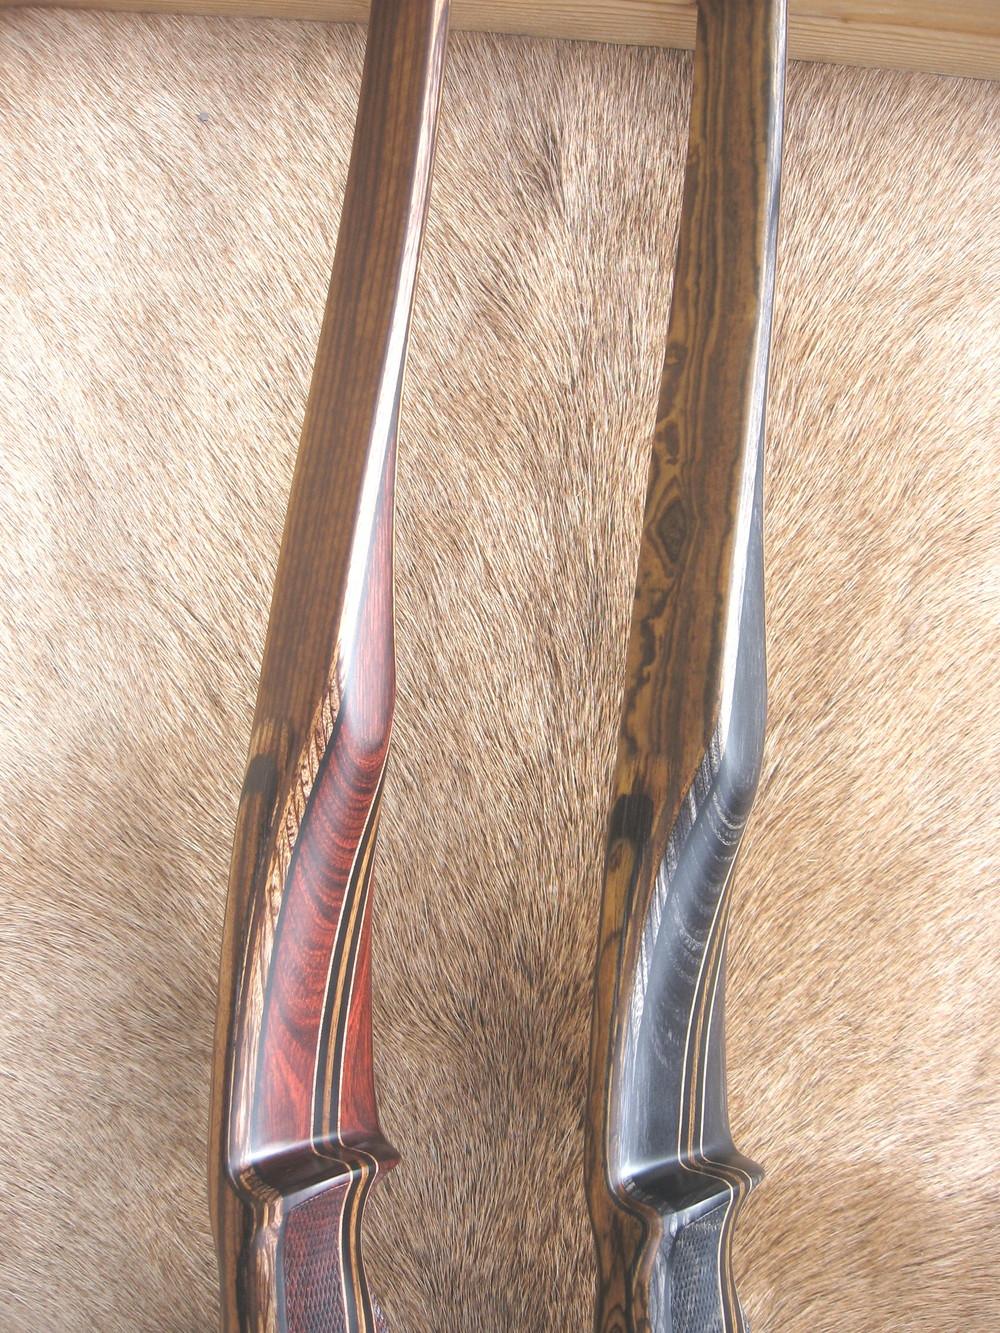 Riosewod Dym Riser w/ Zebrawood Limbs  Charcoal Dym Riser w/ Bocote Limbs